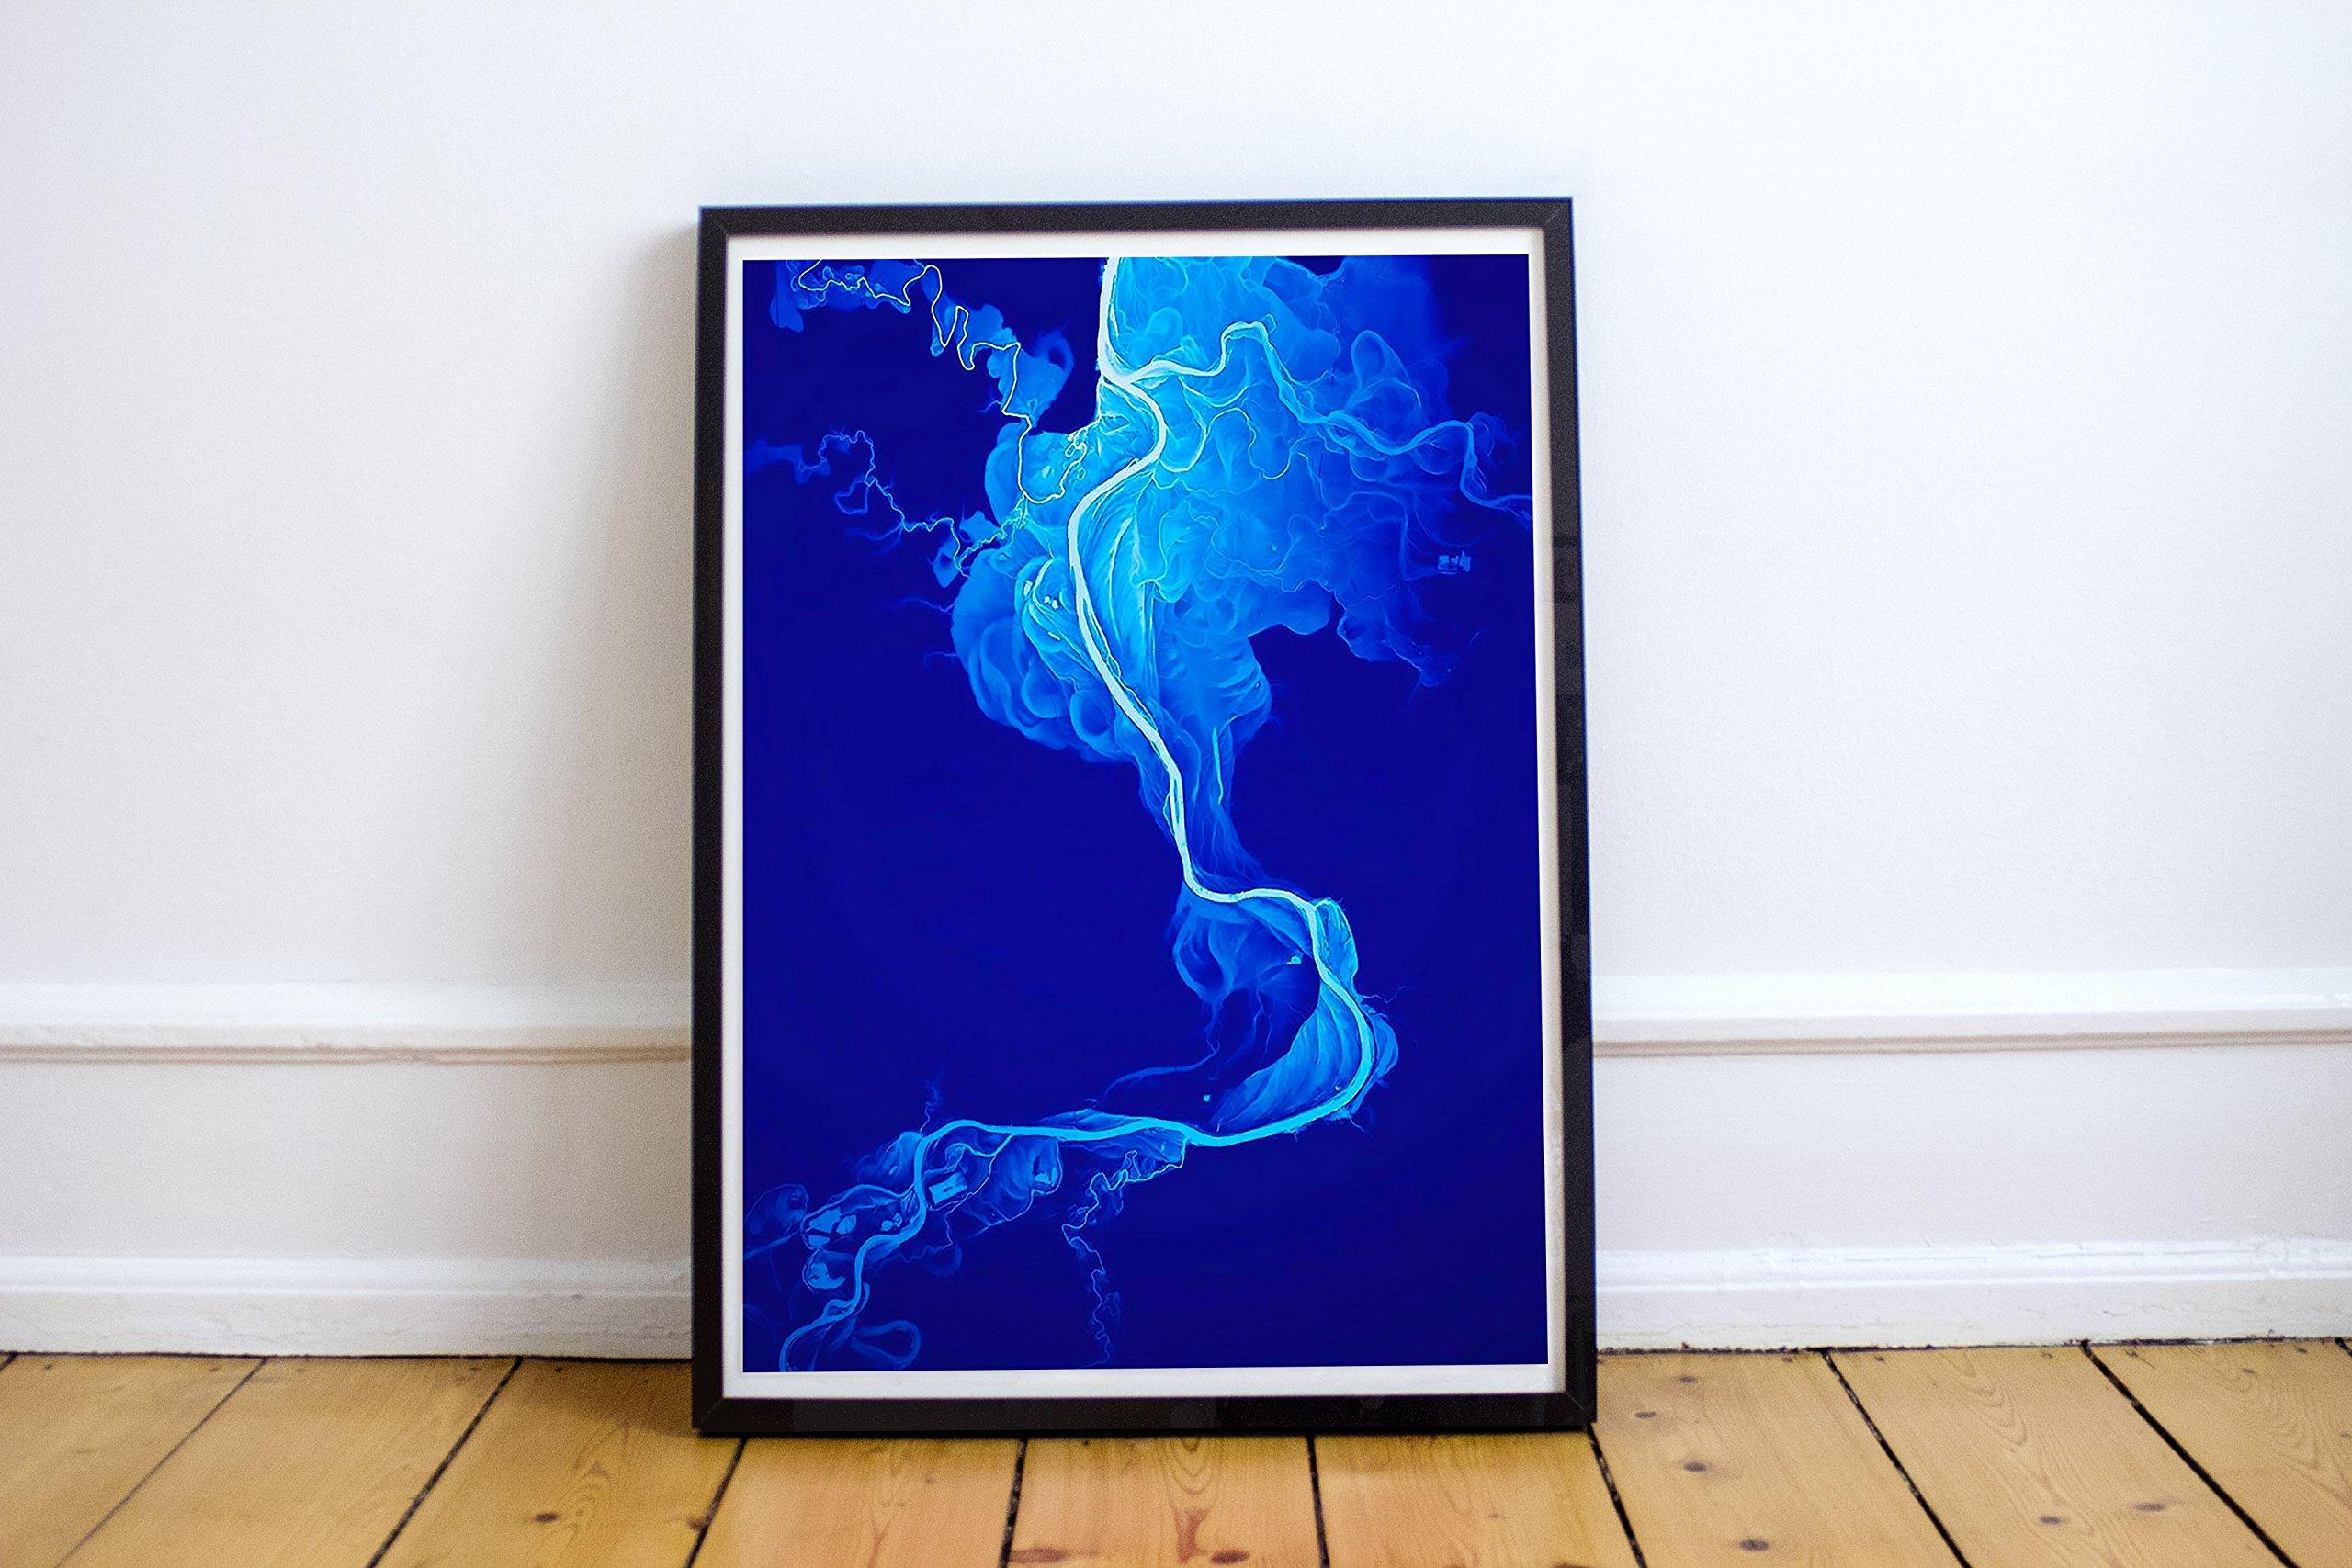 Blue Smoke Abstract Art